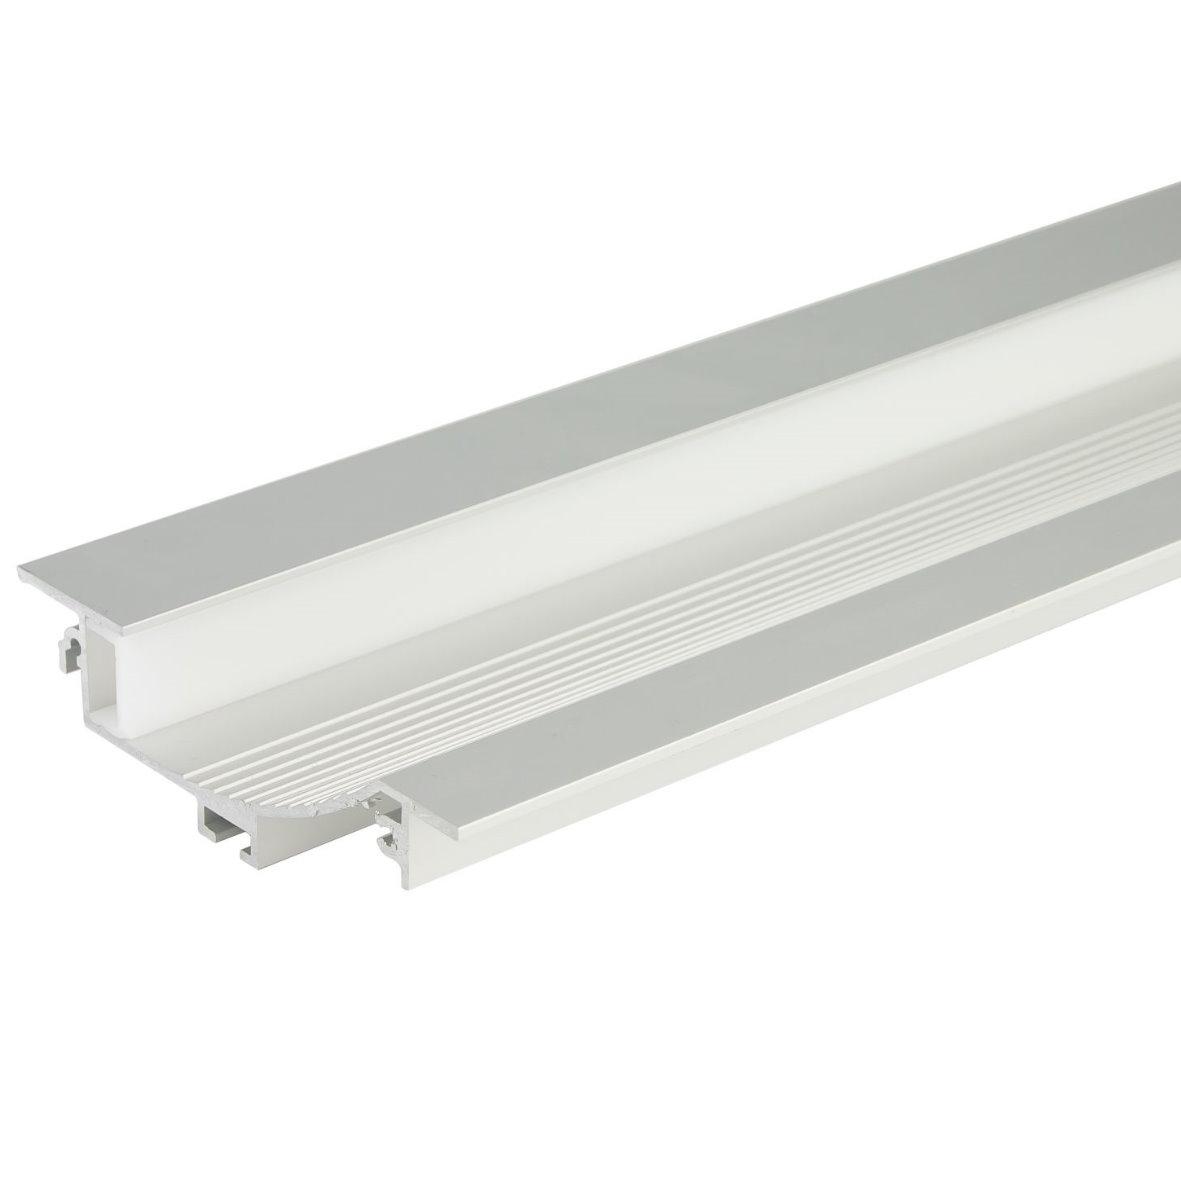 34 9 m led alu profil aluprofil schiene aluminium f r strip stripe streifen ebay. Black Bedroom Furniture Sets. Home Design Ideas